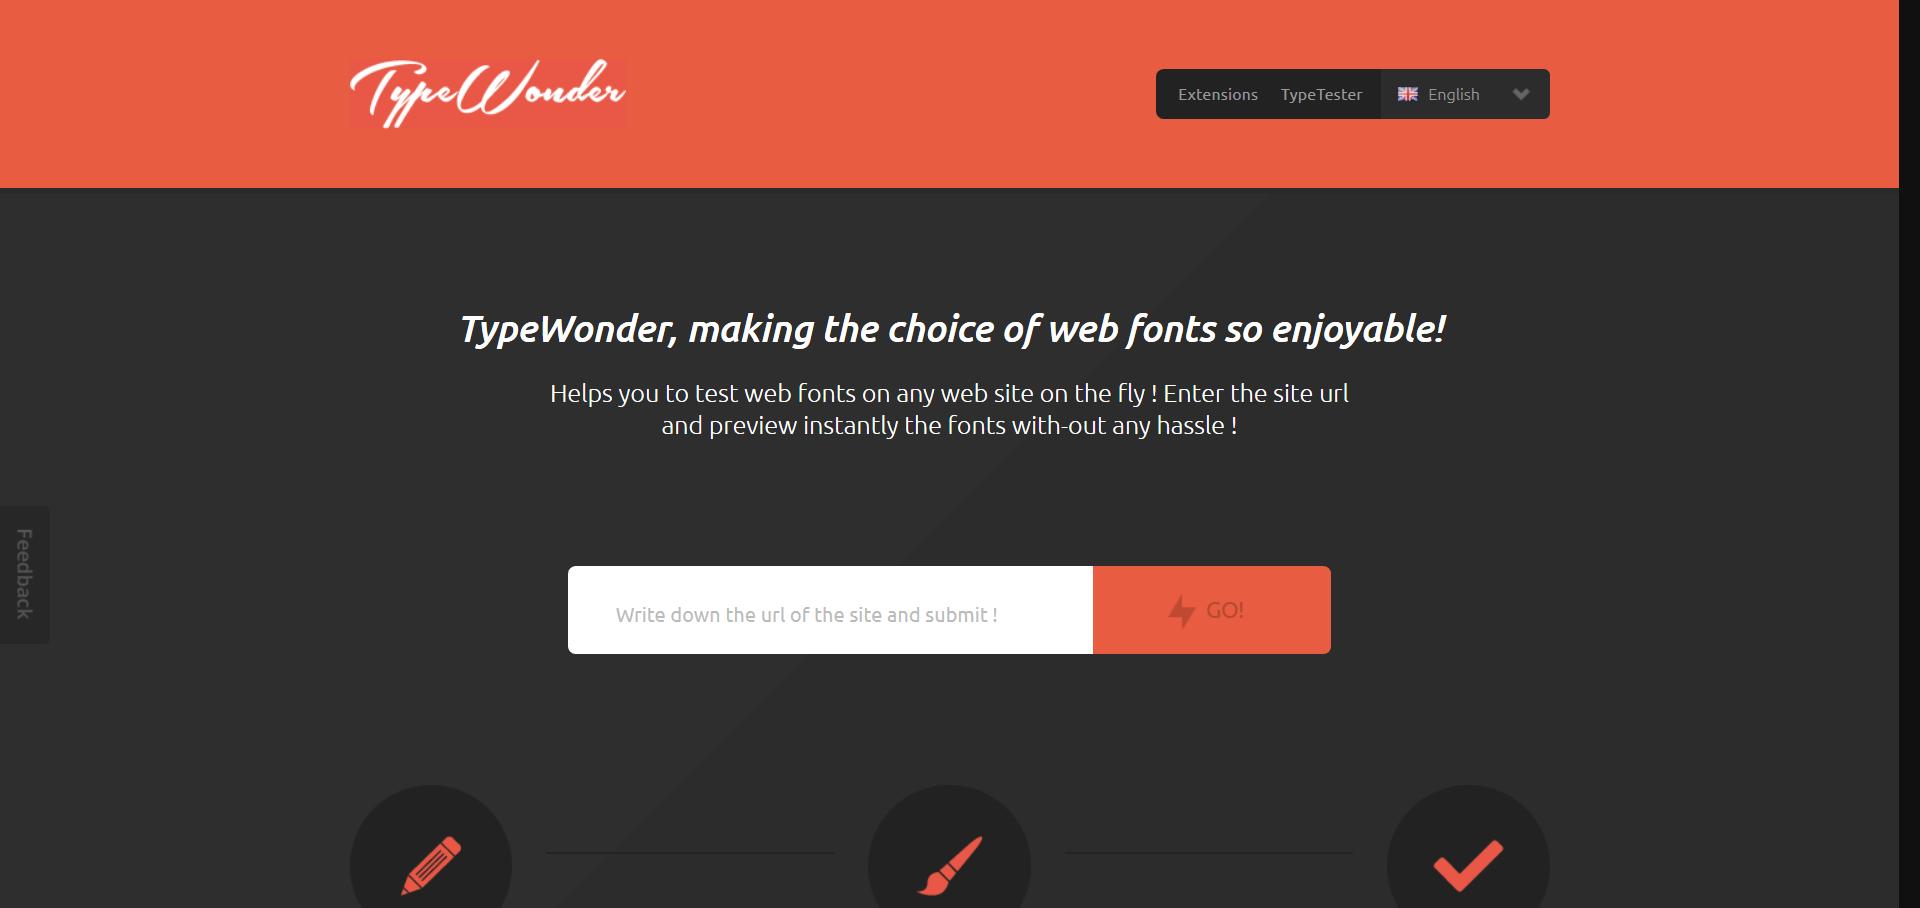 TypeWonder, making the choice of web fonts so enjoyable